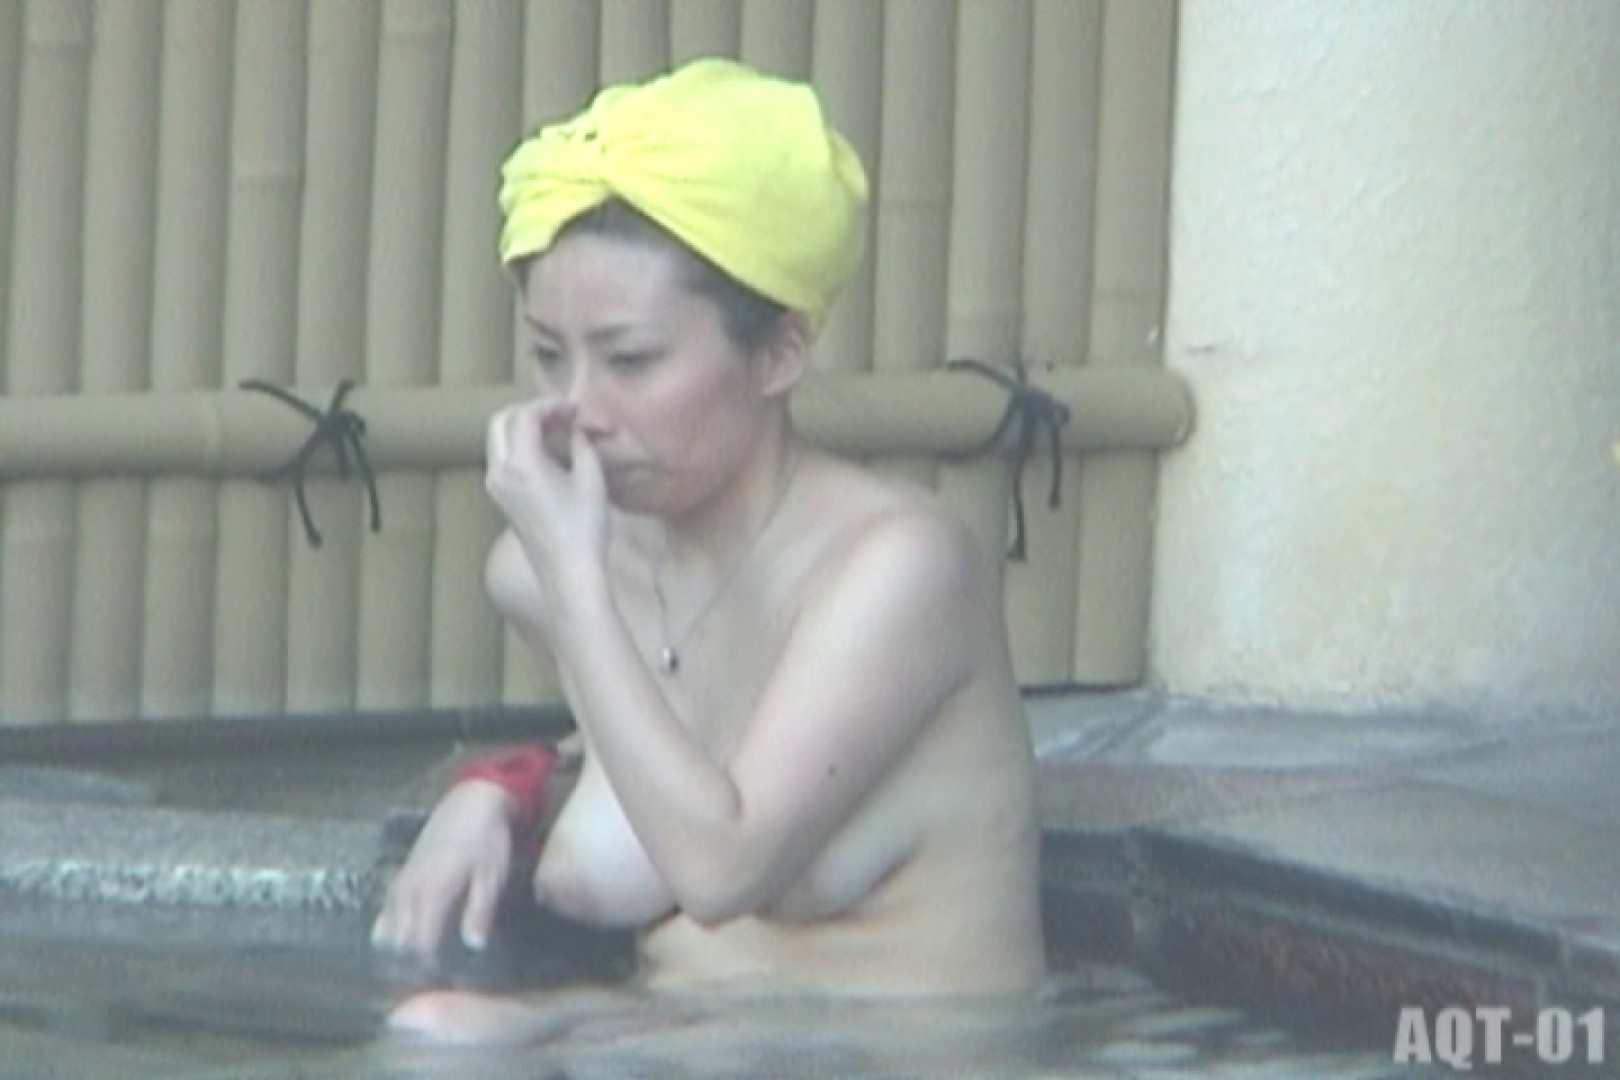 Aquaな露天風呂Vol.713 盗撮特撮 | OLのプライベート  10pic 7